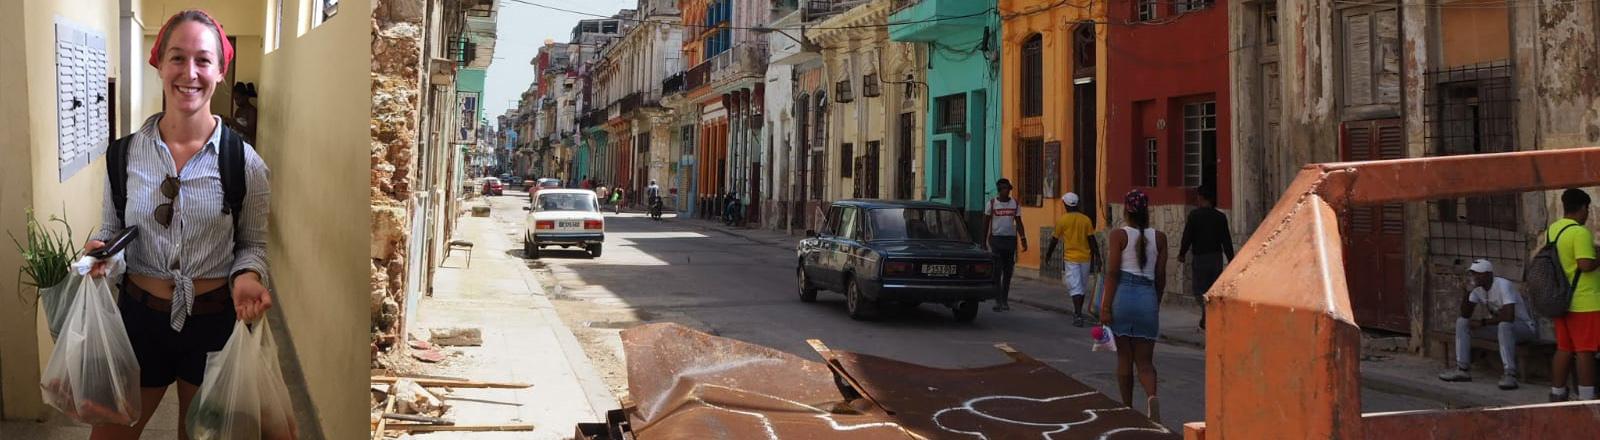 Studentin Mara Neugebauer, Straße in Havanna, Kuba